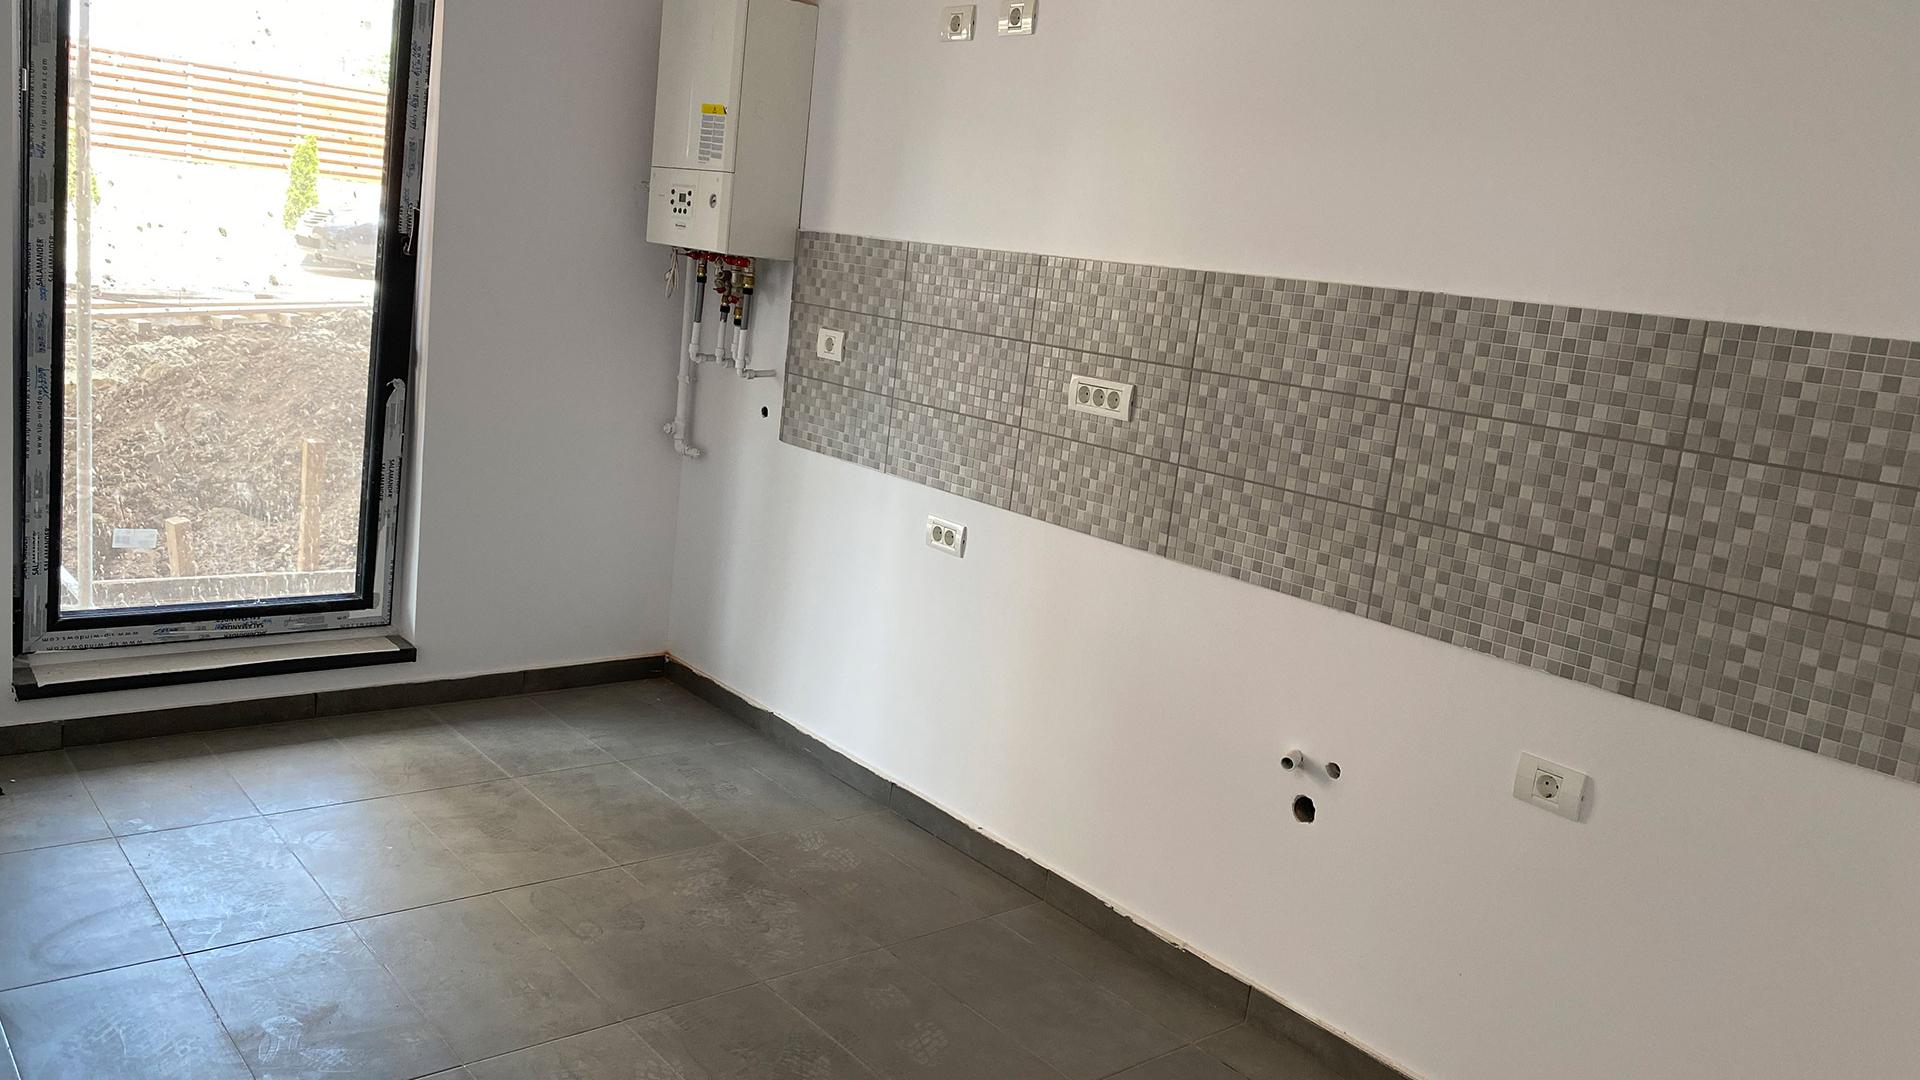 Stadiu executie Uverturii Residence 13 Iulie 2020 - Apartamente si garsoniere de vanzare Militari, Gorjului - 7